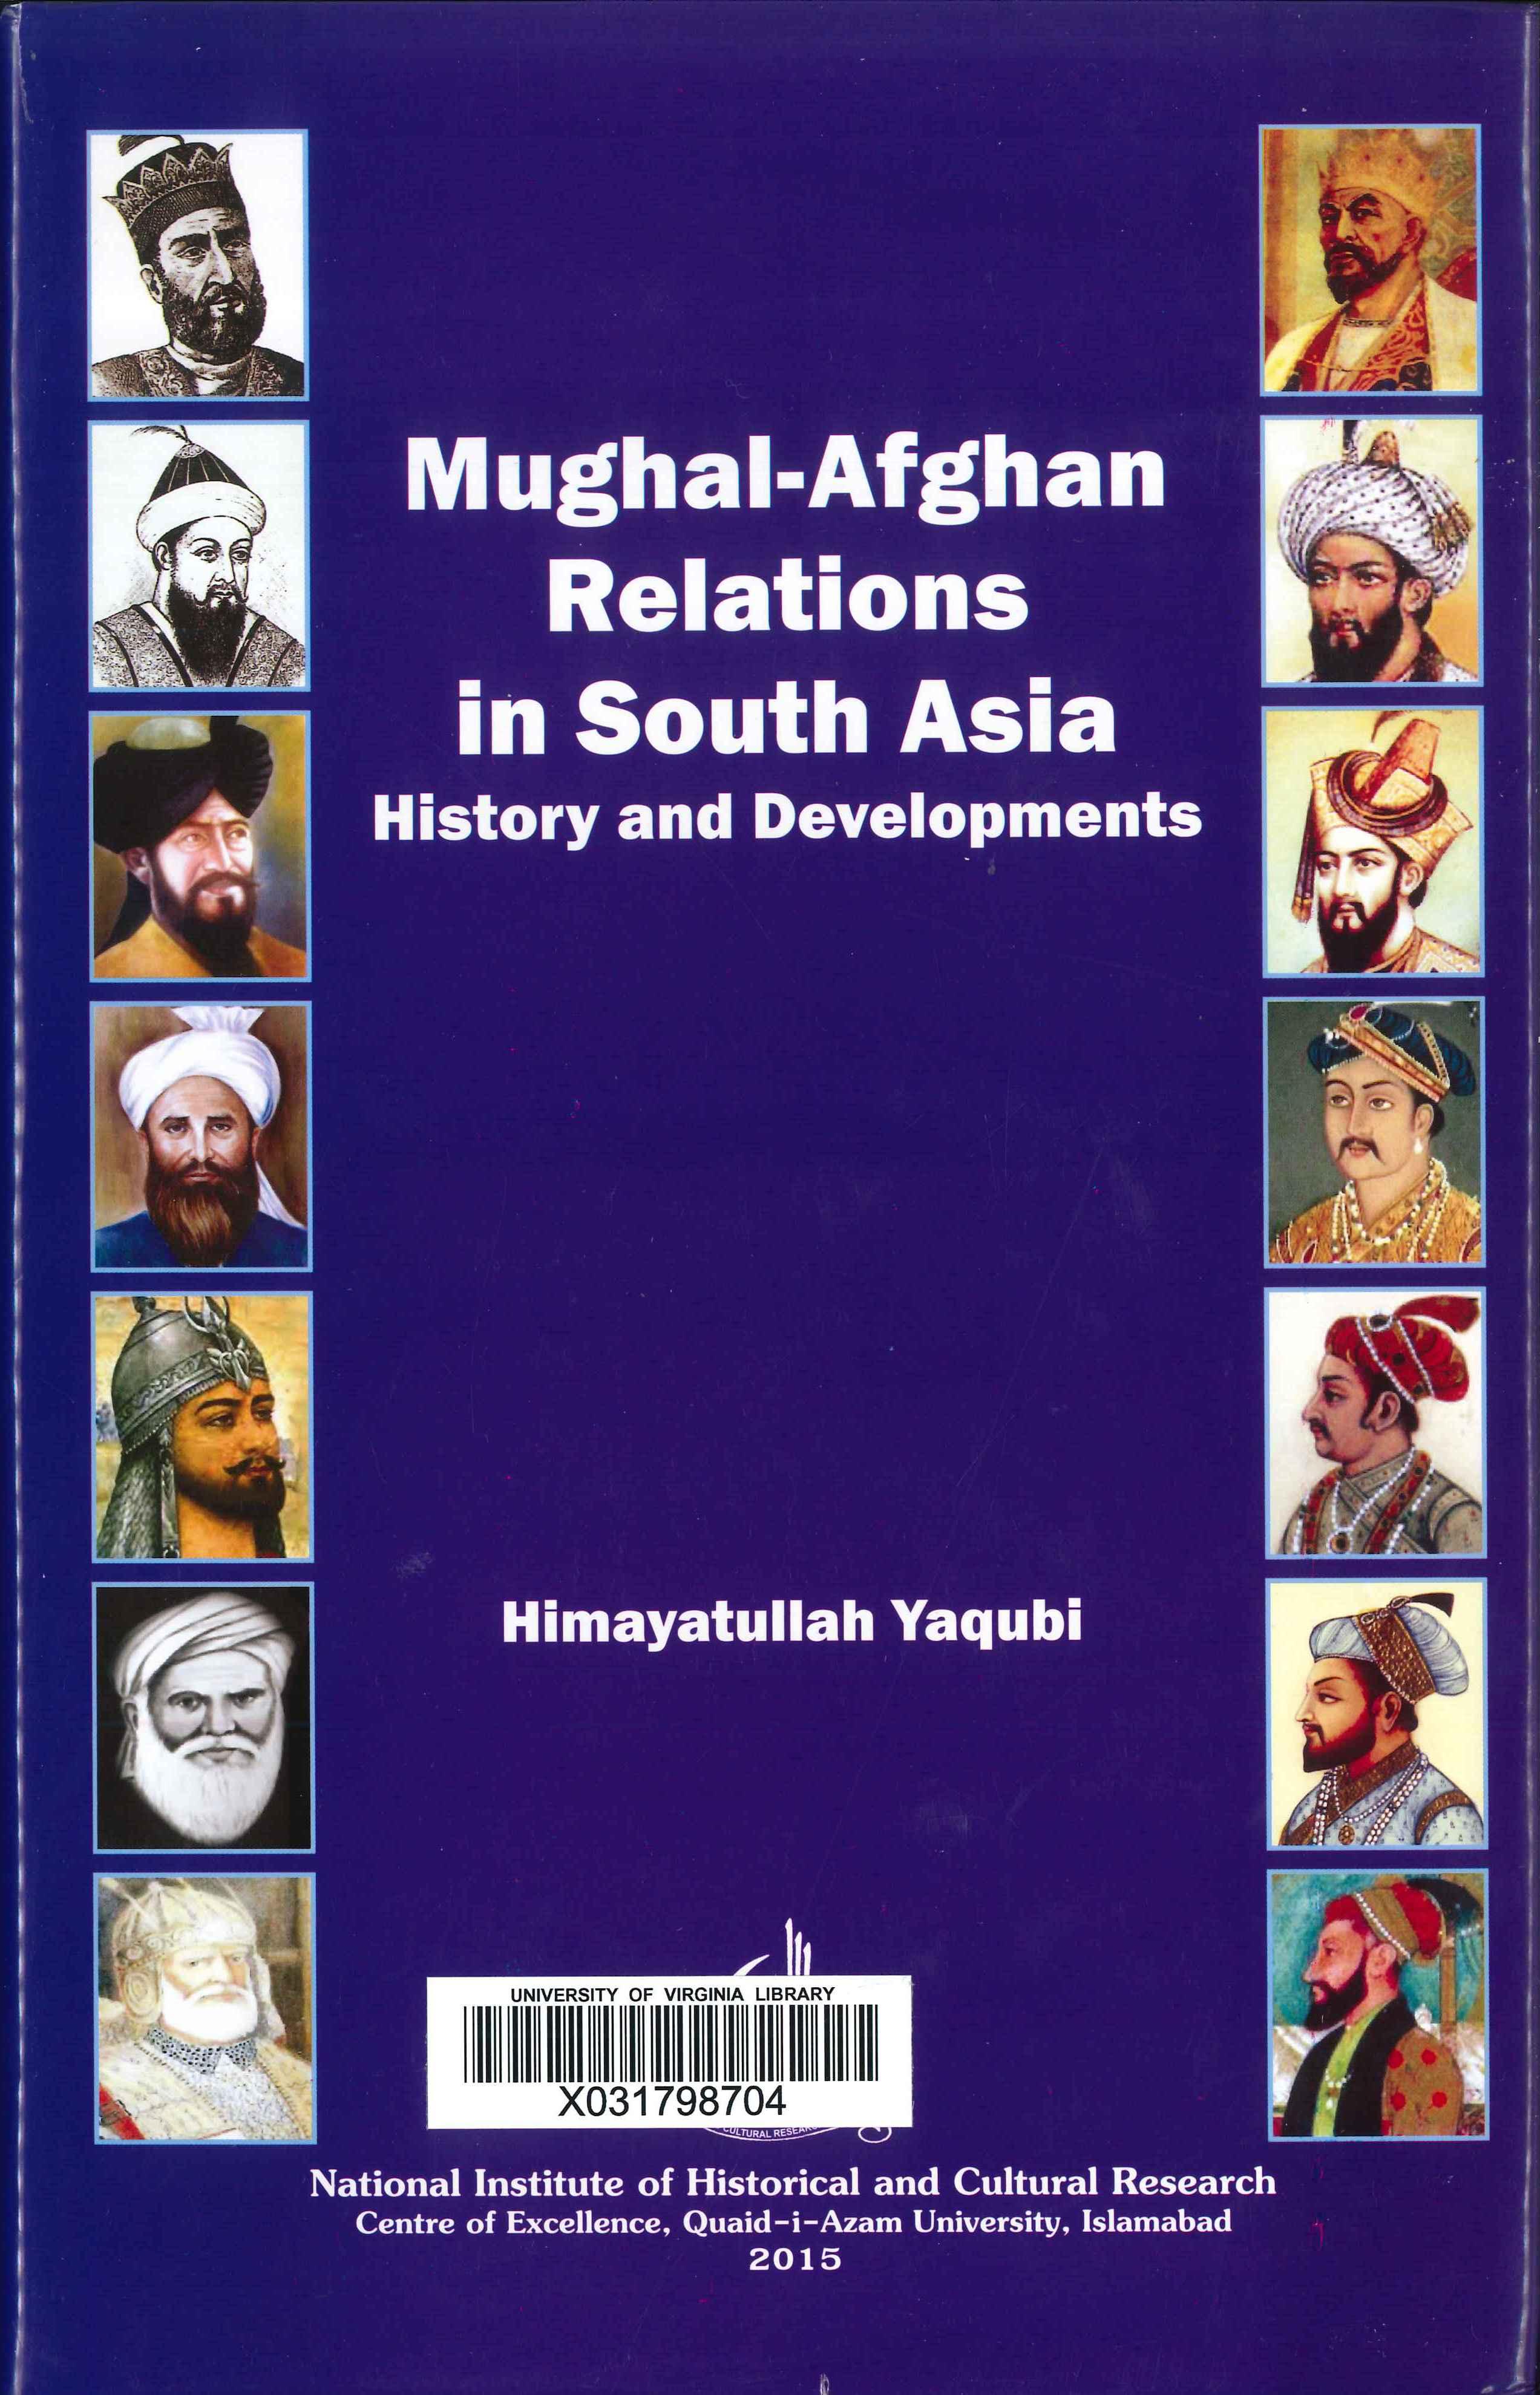 Mughal-Afghan relations